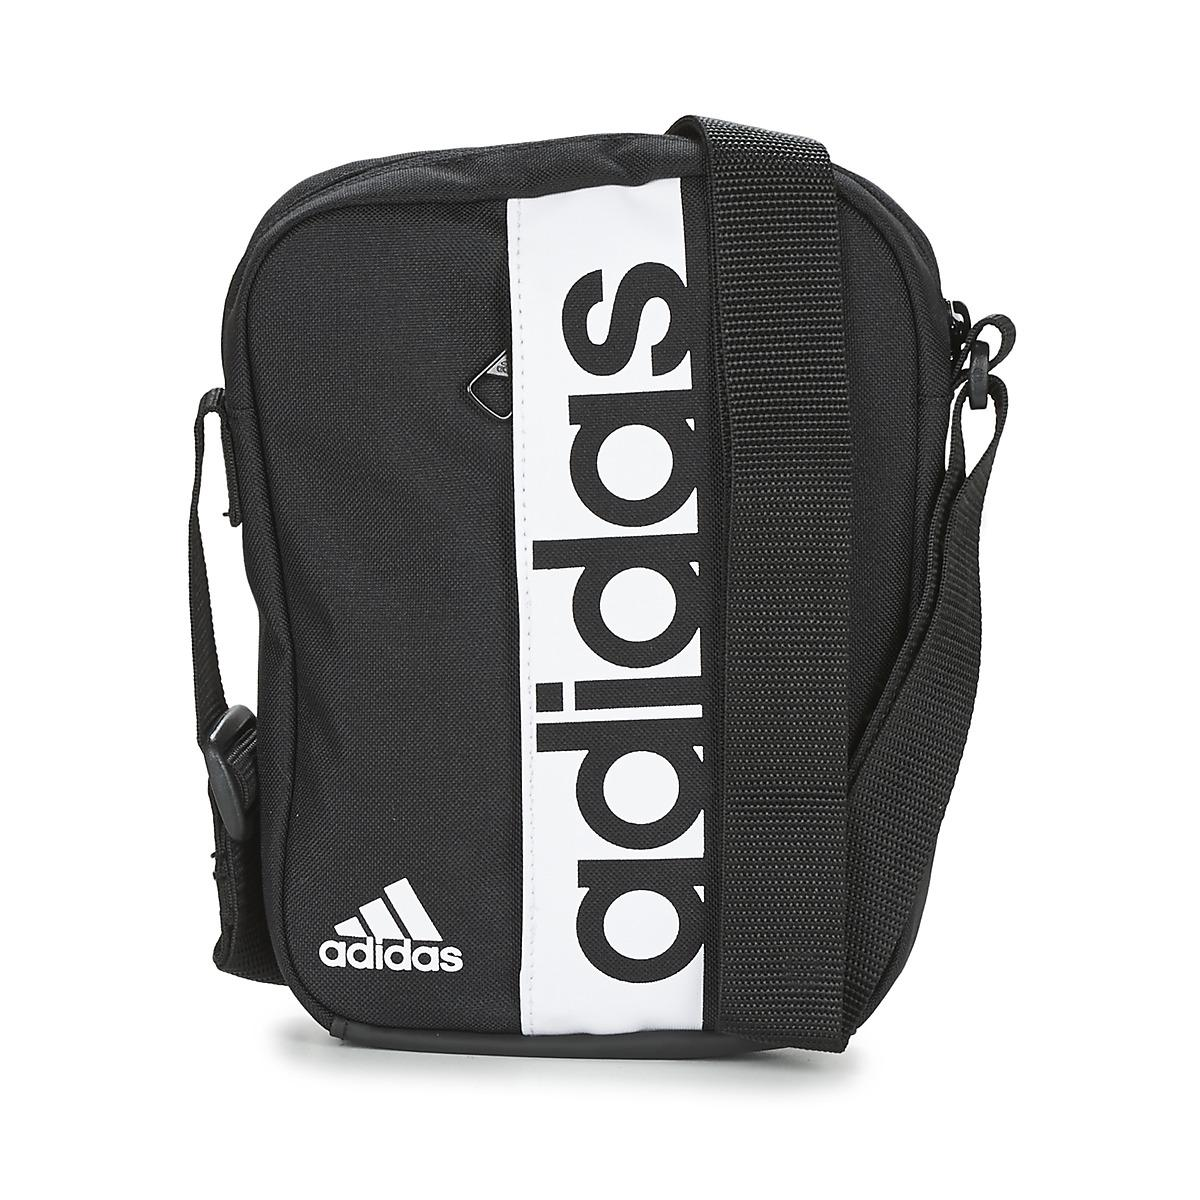 adidas Linear Organizer Men s Pouch In Black in Black for Men - Lyst d3cdfb1c5f